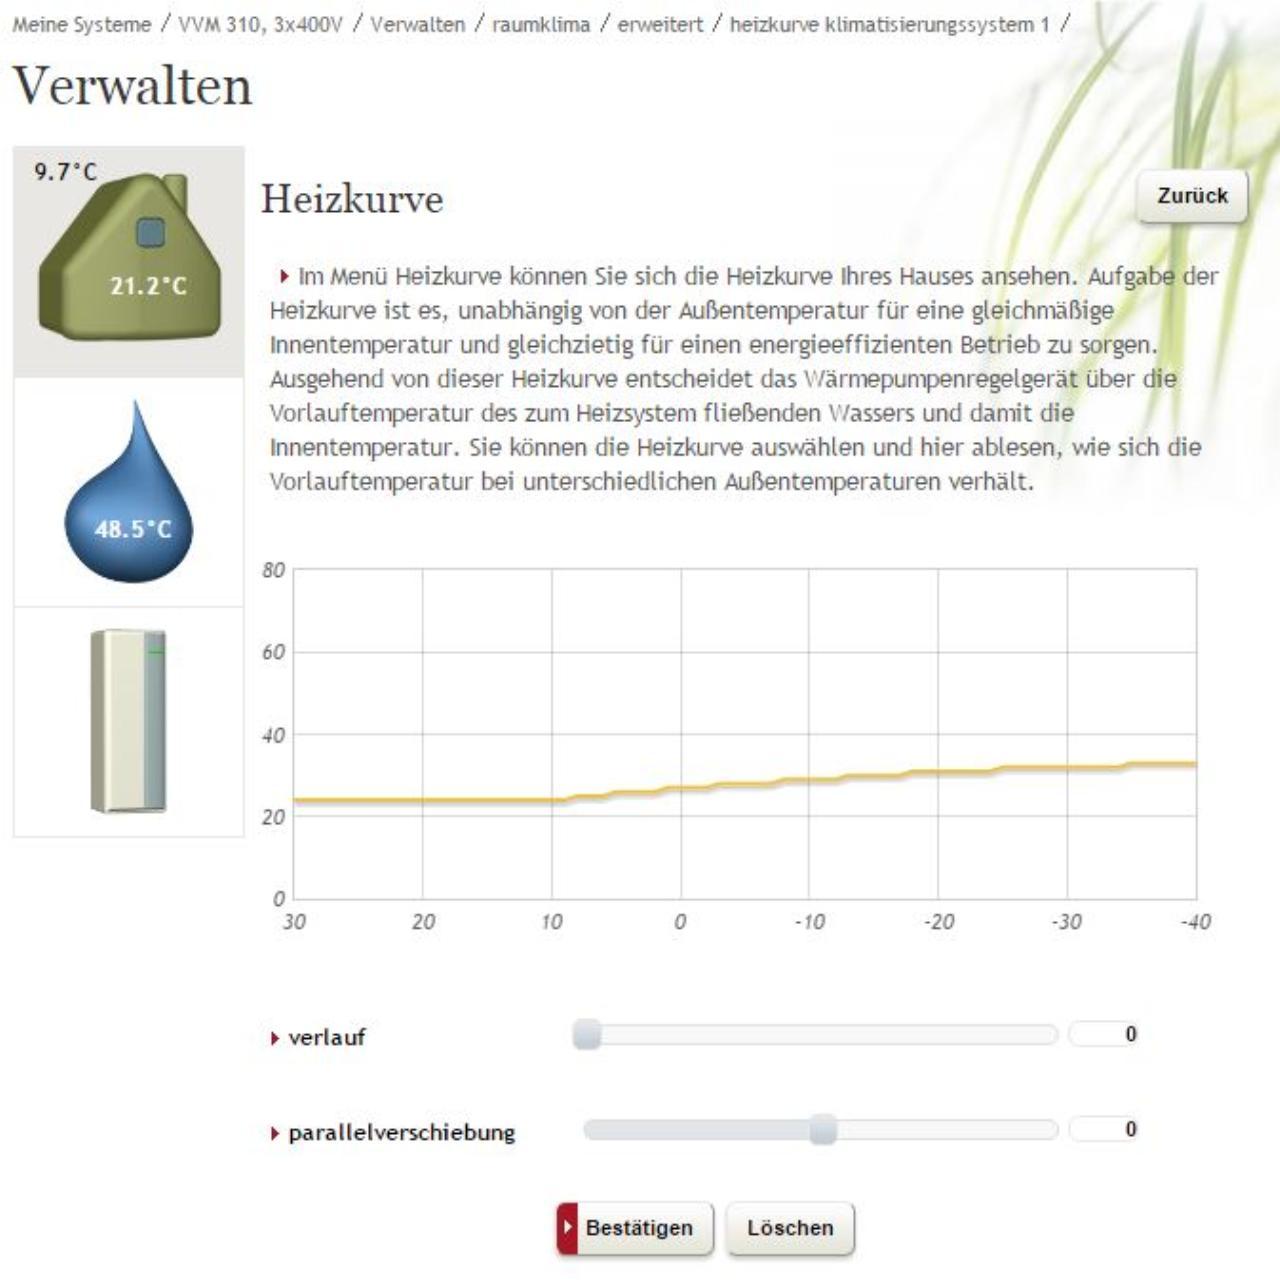 http://www.energiesparhaus.at/bilderupload2016/20161027706012.jpg